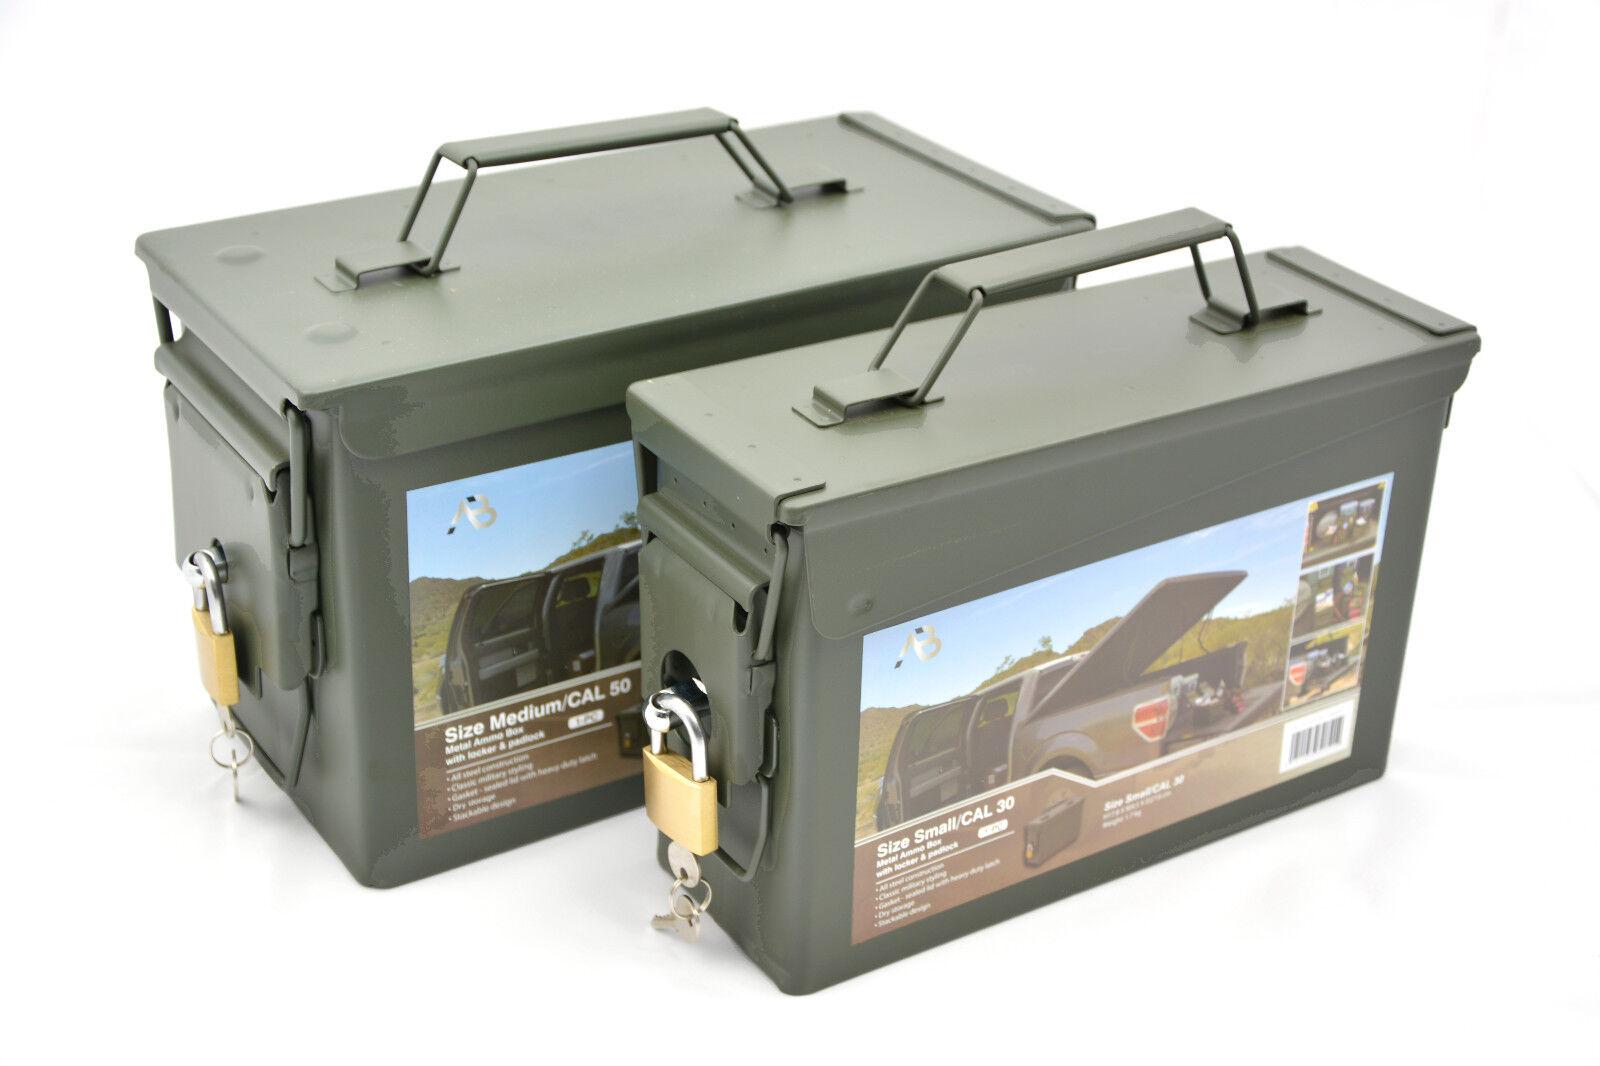 Us Ammunition Box Transport  Box Tool Chest Transport Box Box Olive  outlet sale